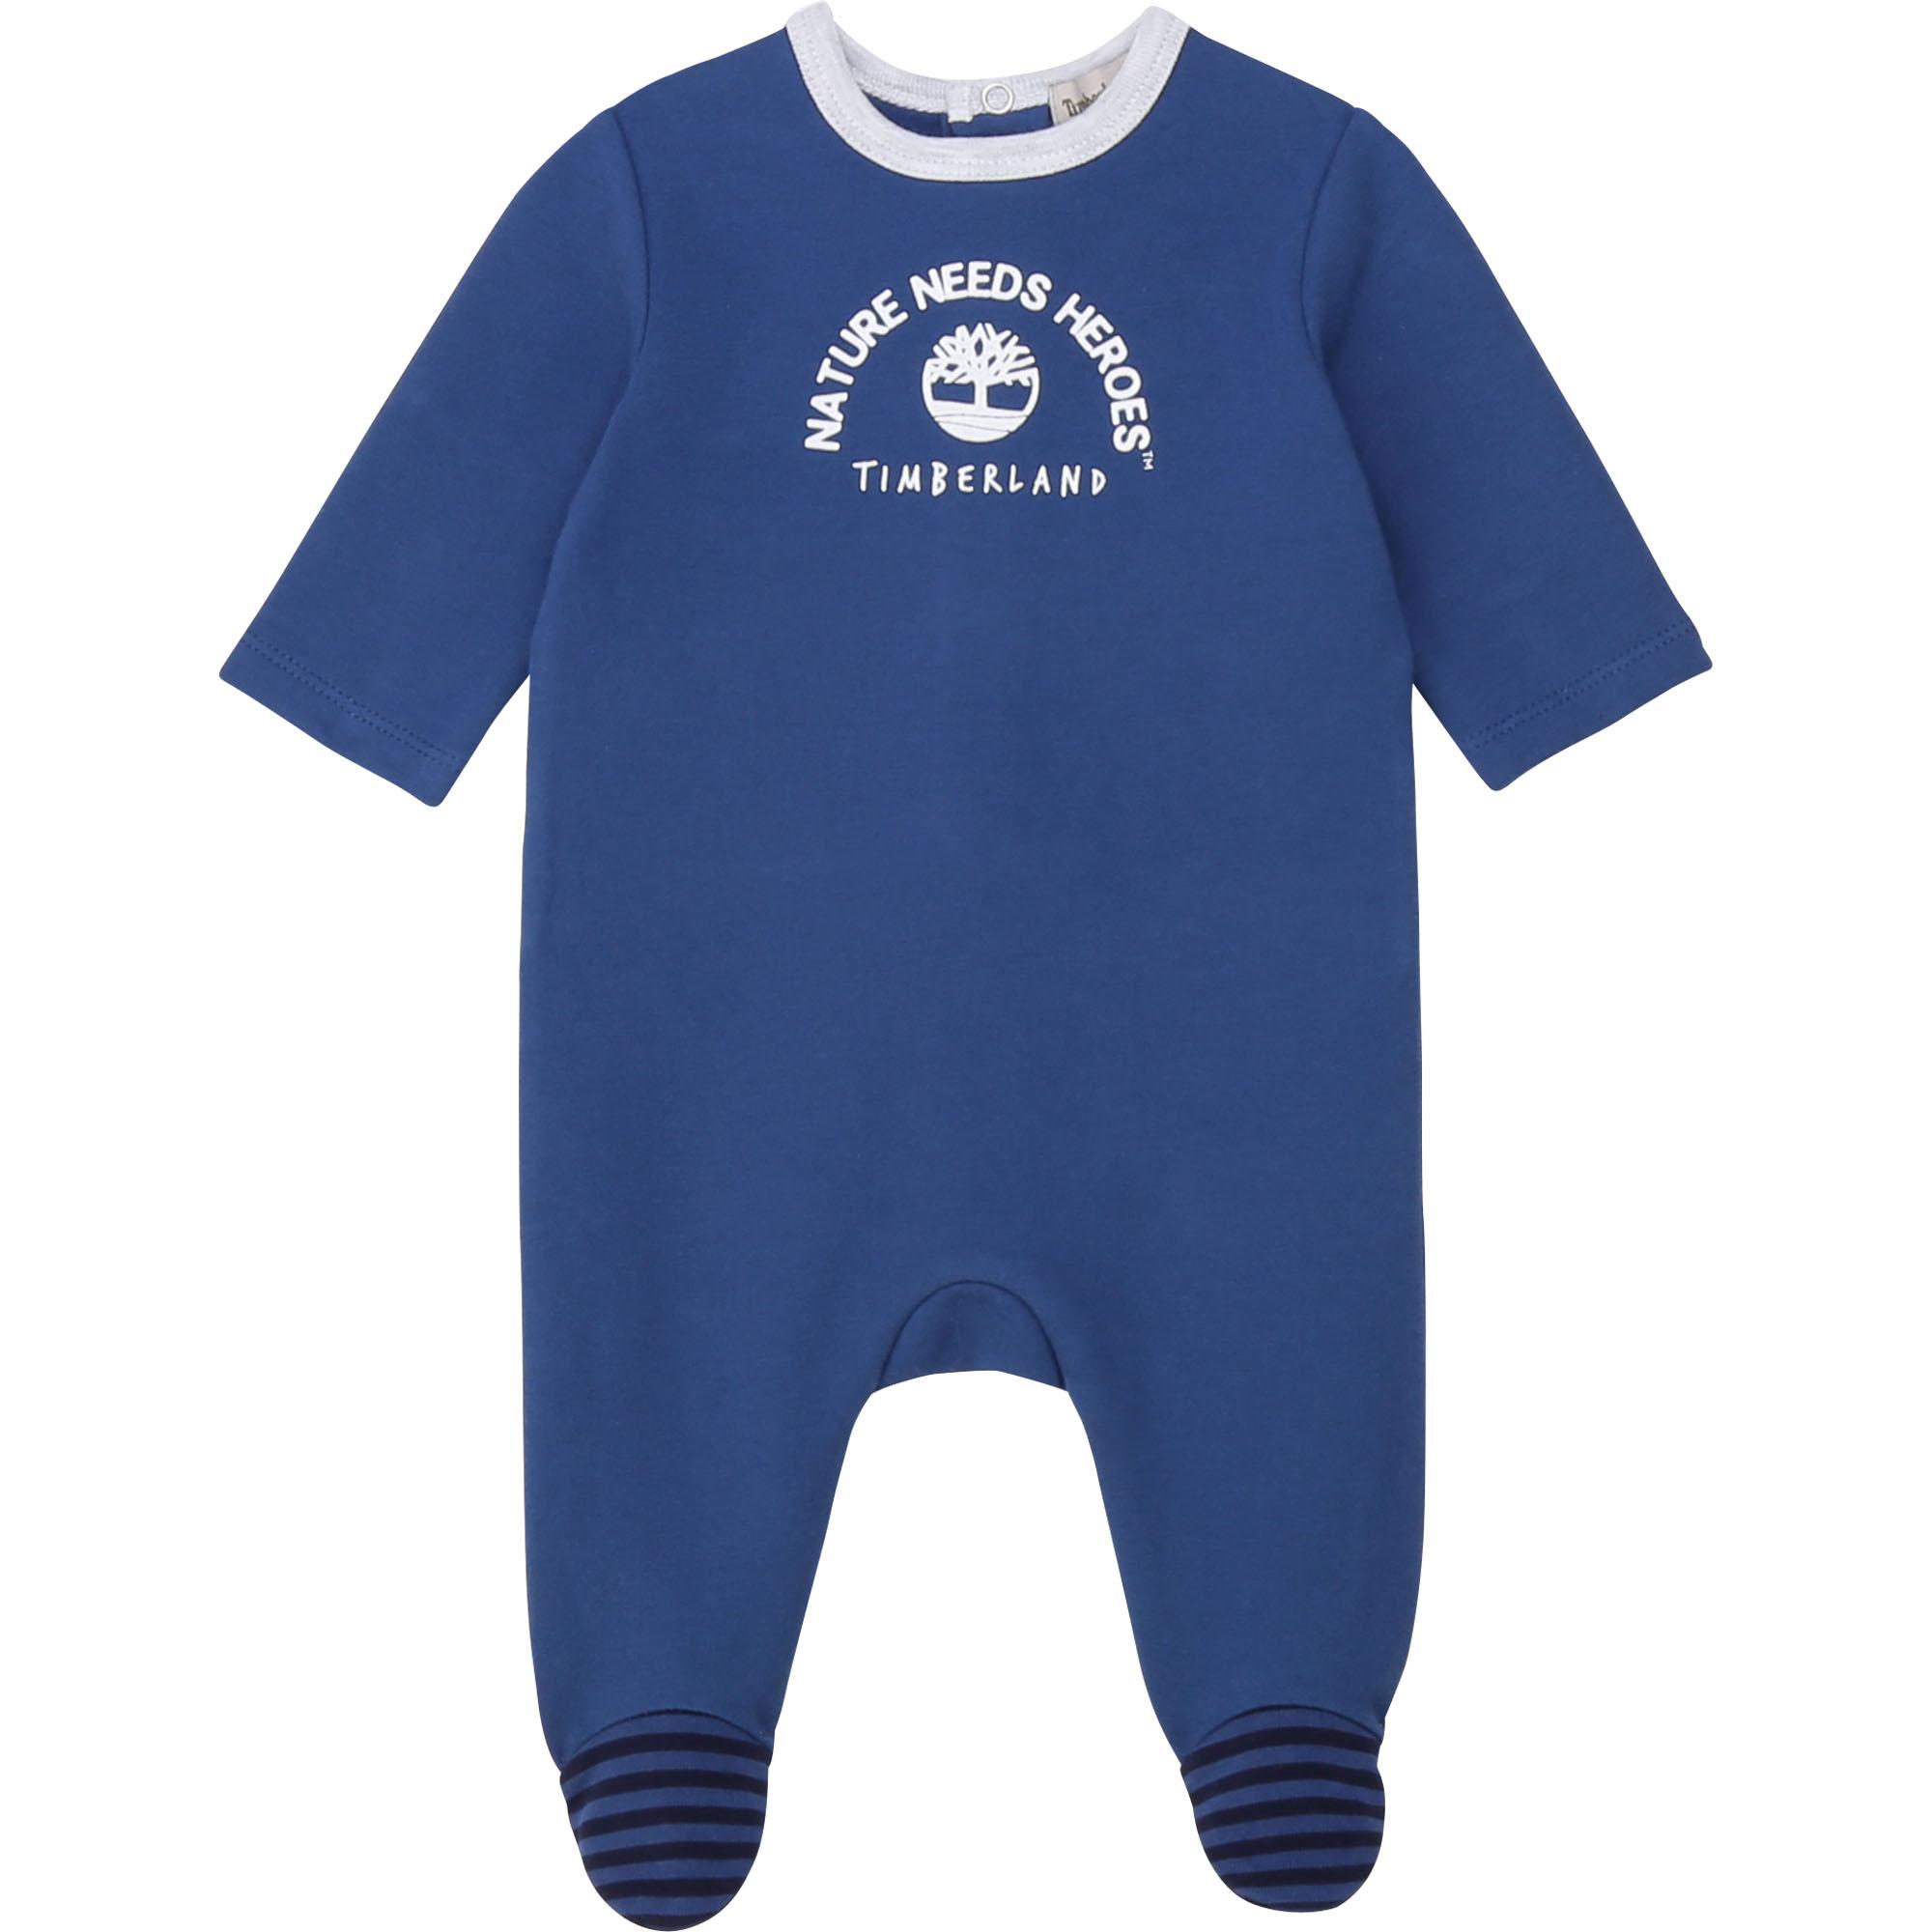 Pyjama en molleton TIMBERLAND BEBE COUCHE GARCON Bleu